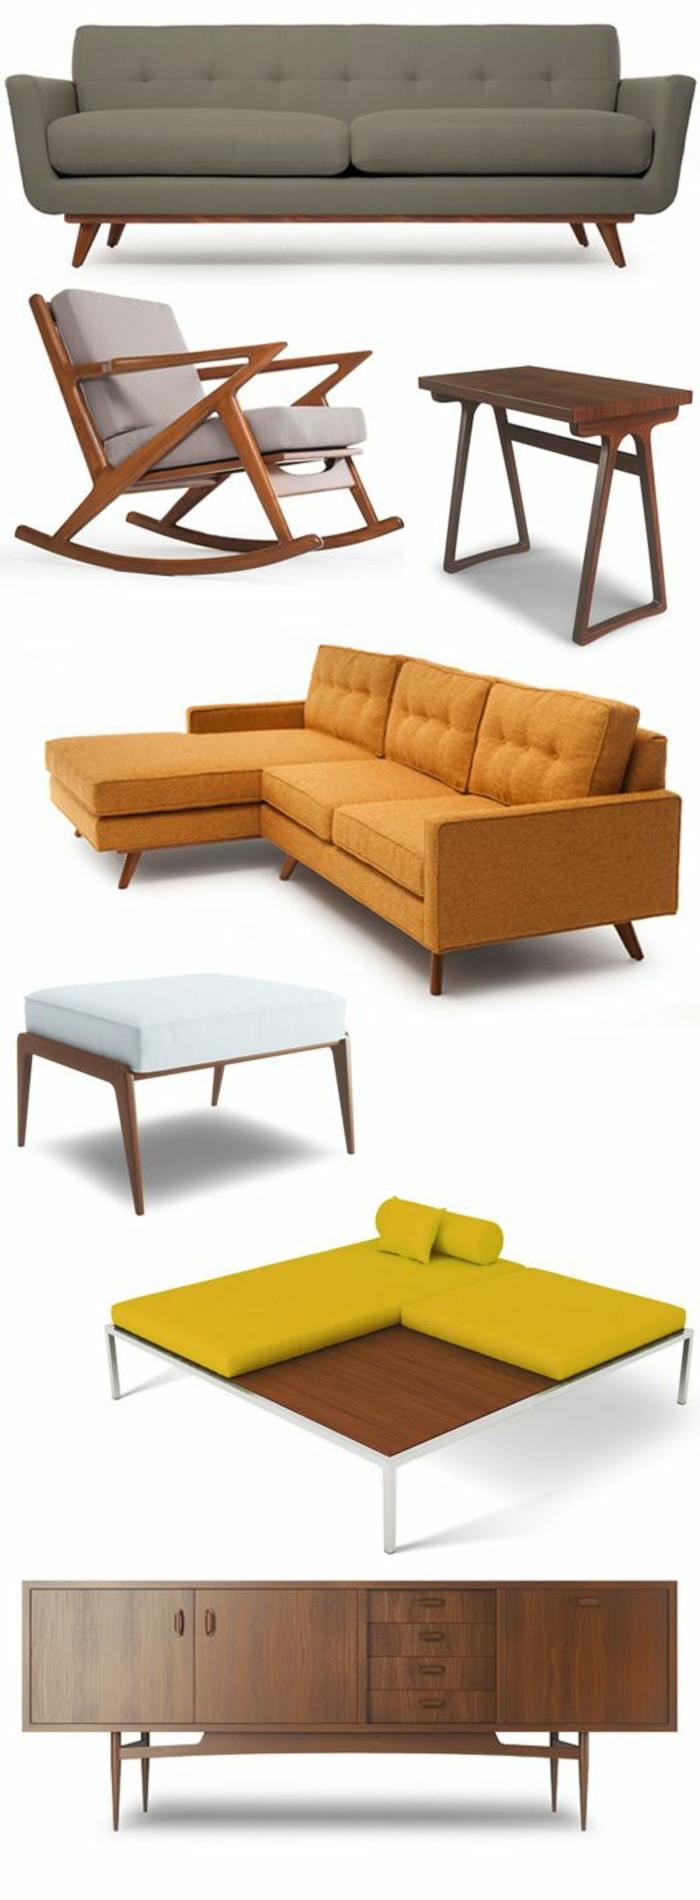 skandinavische möbel wohnzimmer möbel sofa sessel